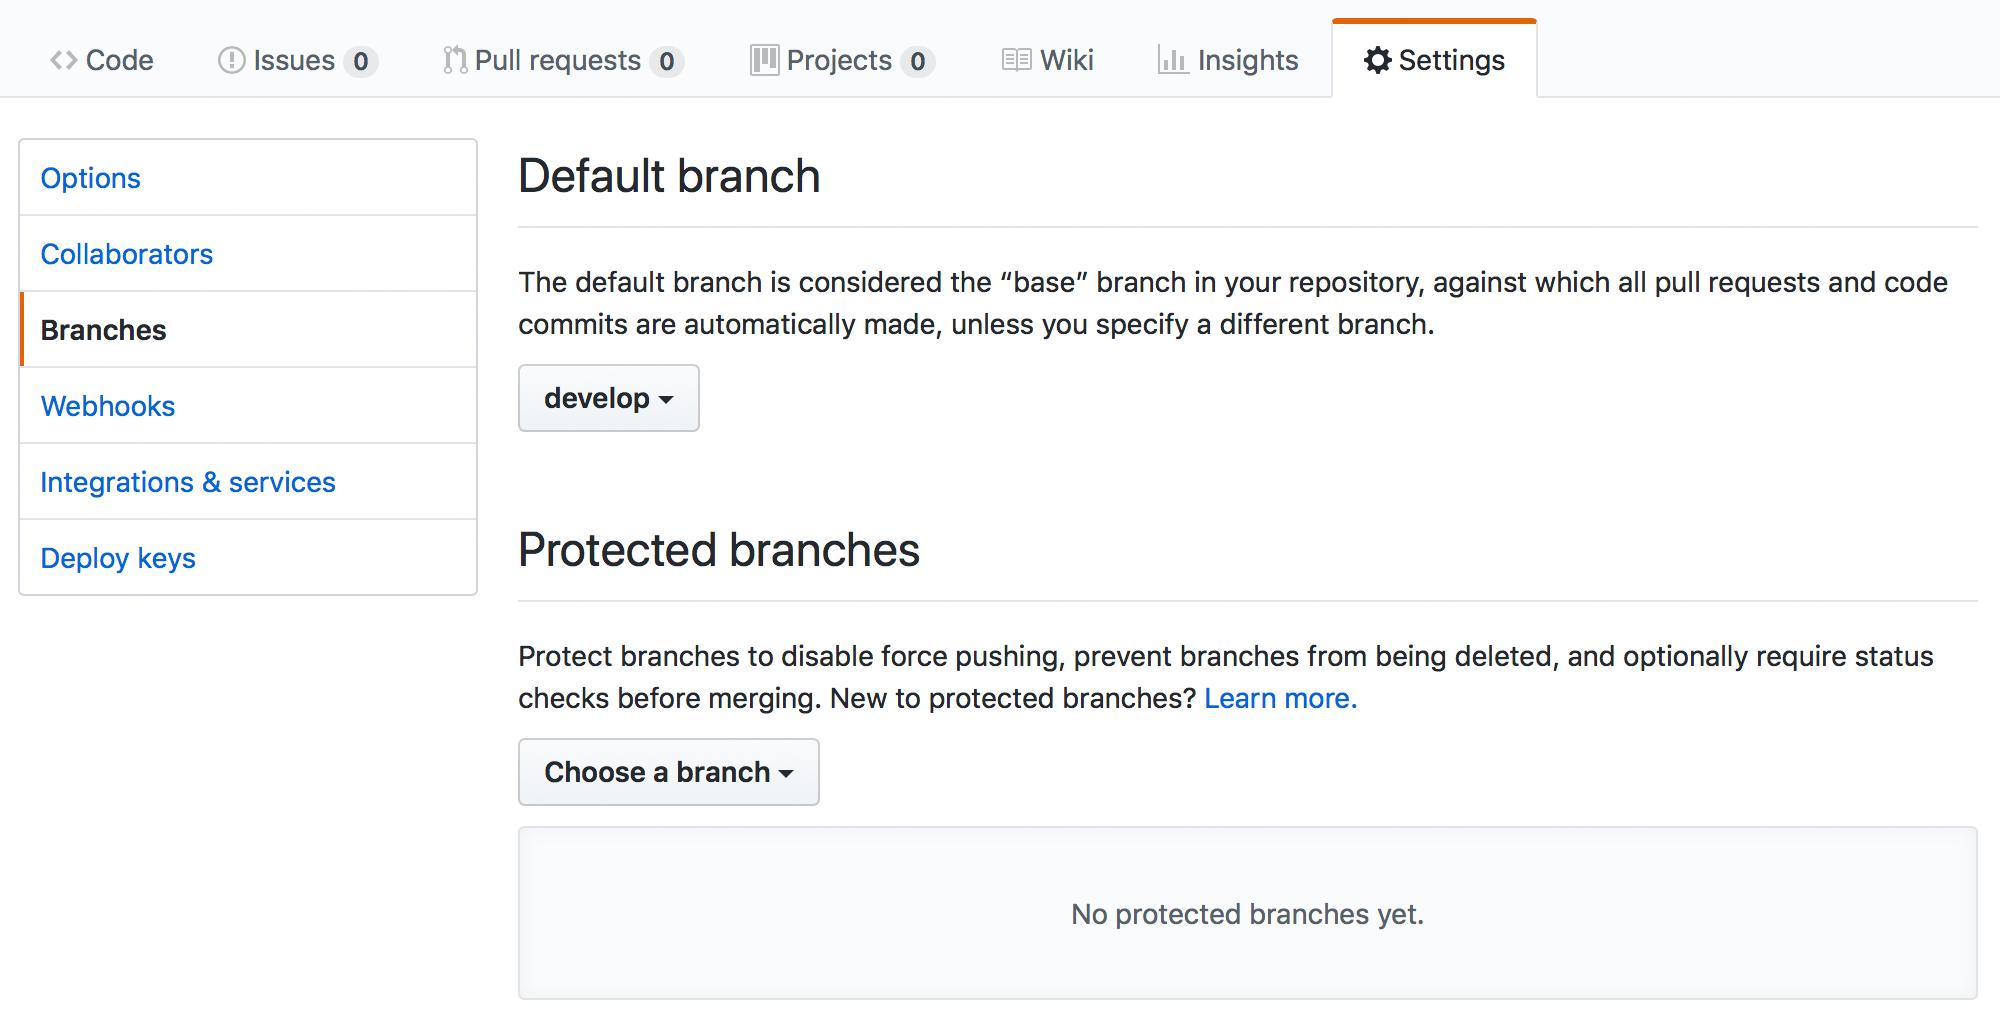 Develop as Default Branch